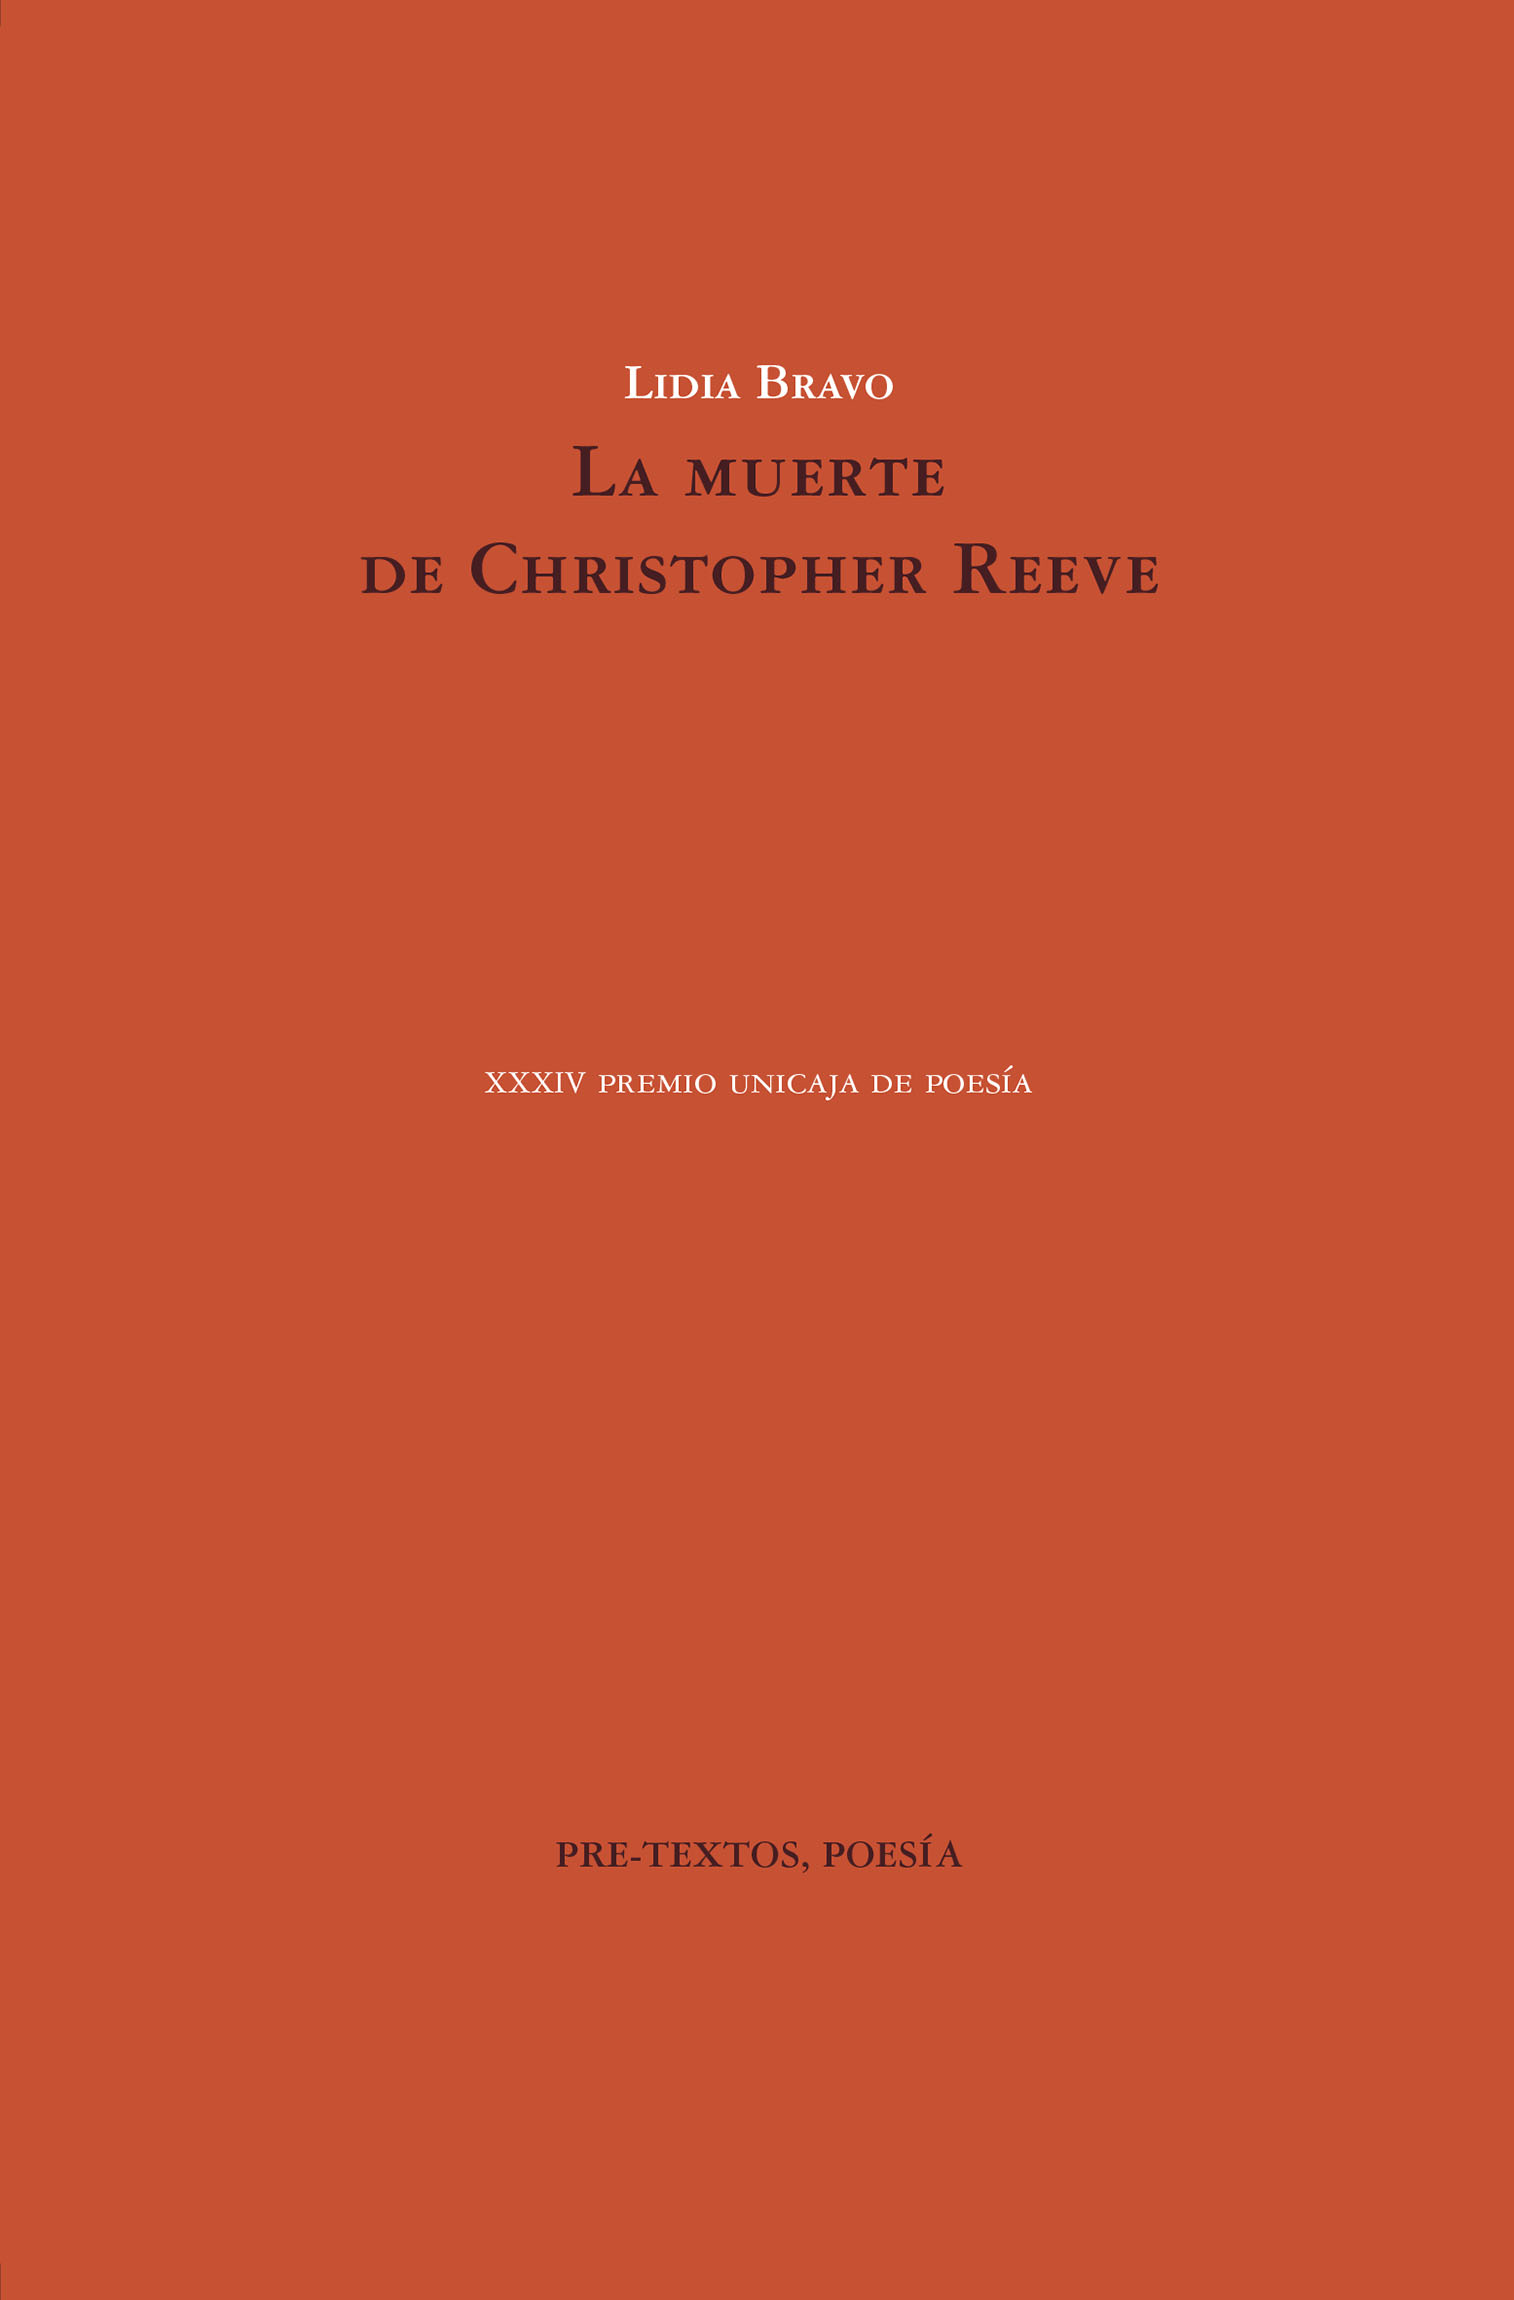 MUERTE DE CHRISTOPHER REEVE, LA